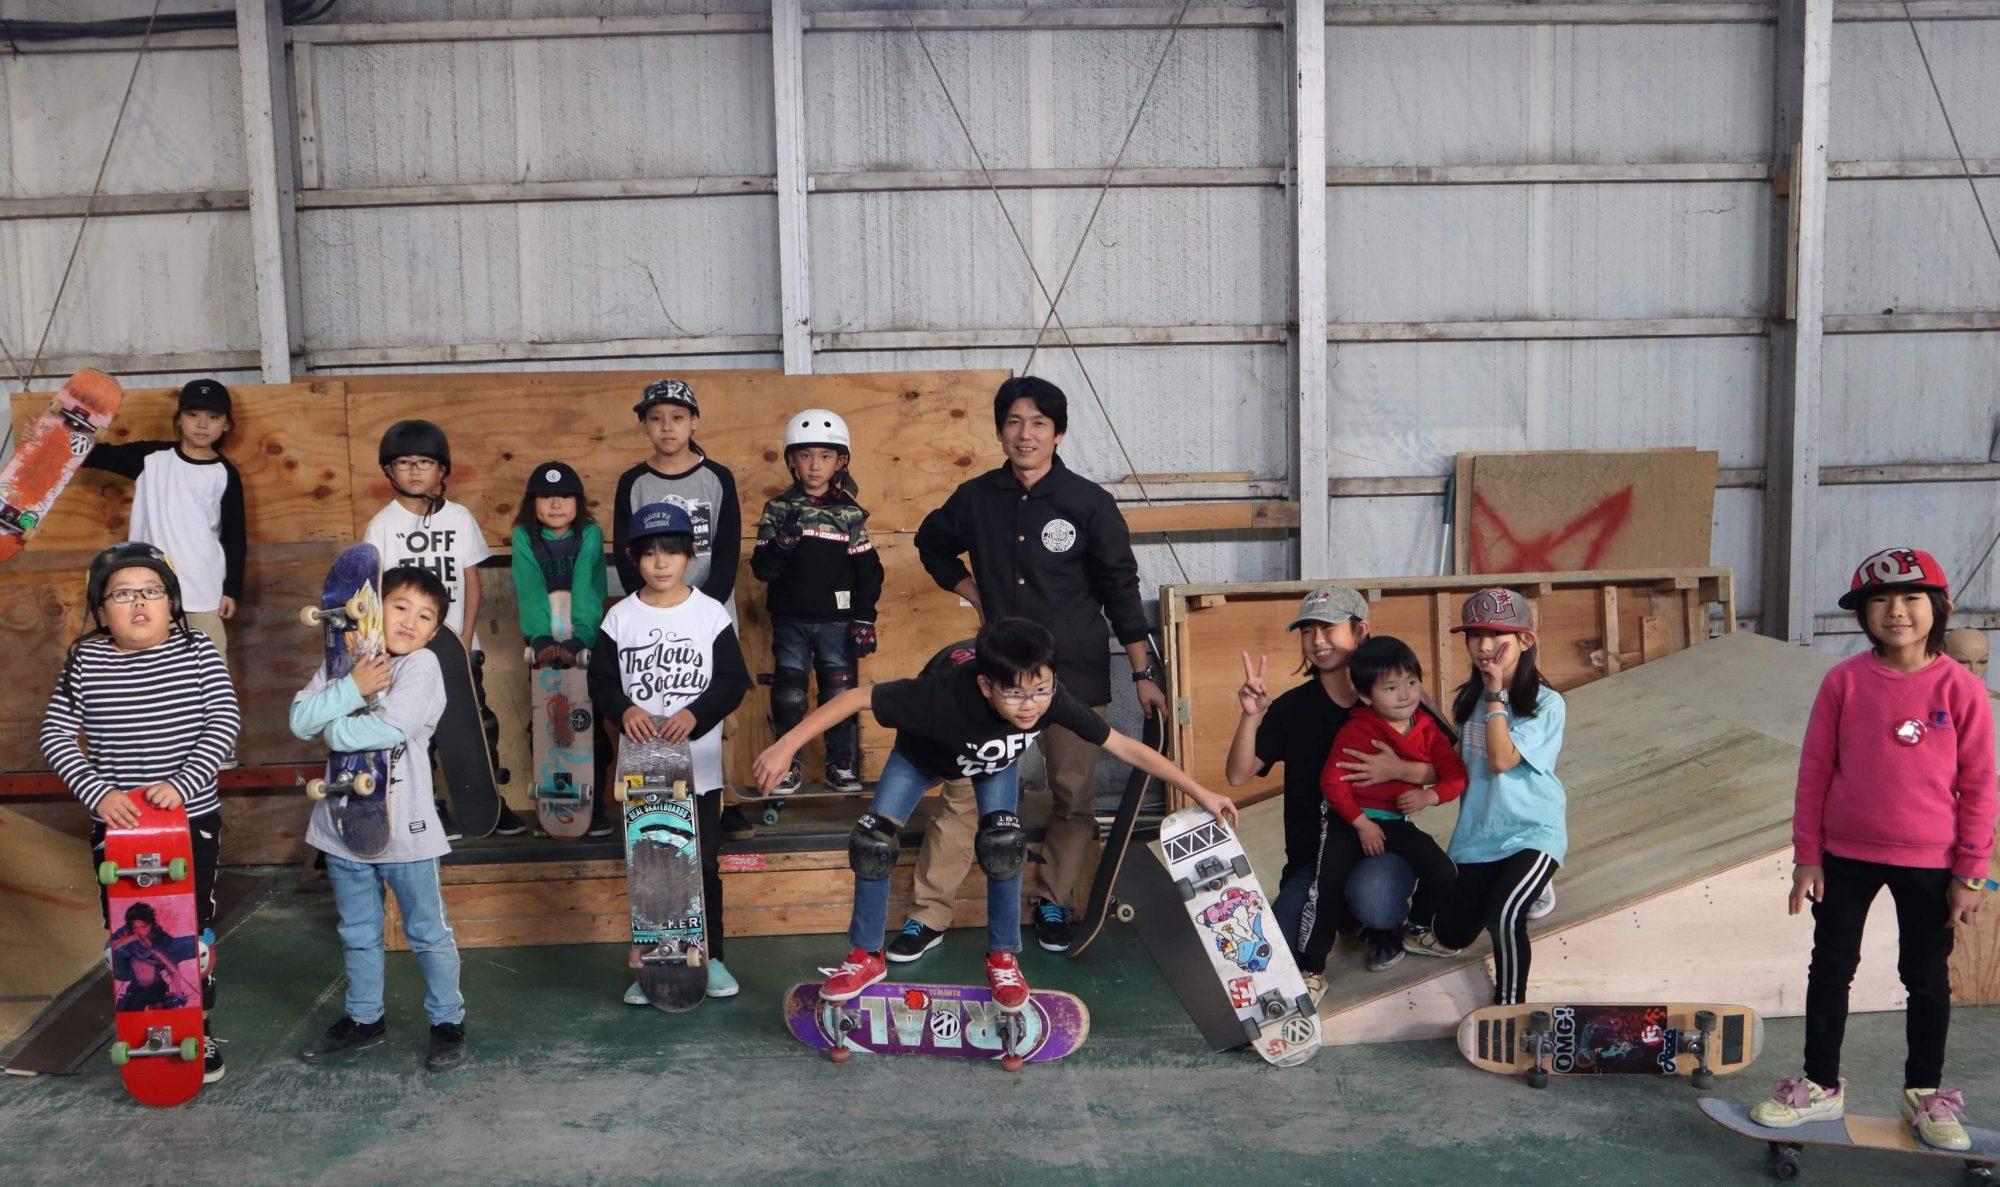 TSBA - 鶴岡スケートボード協会